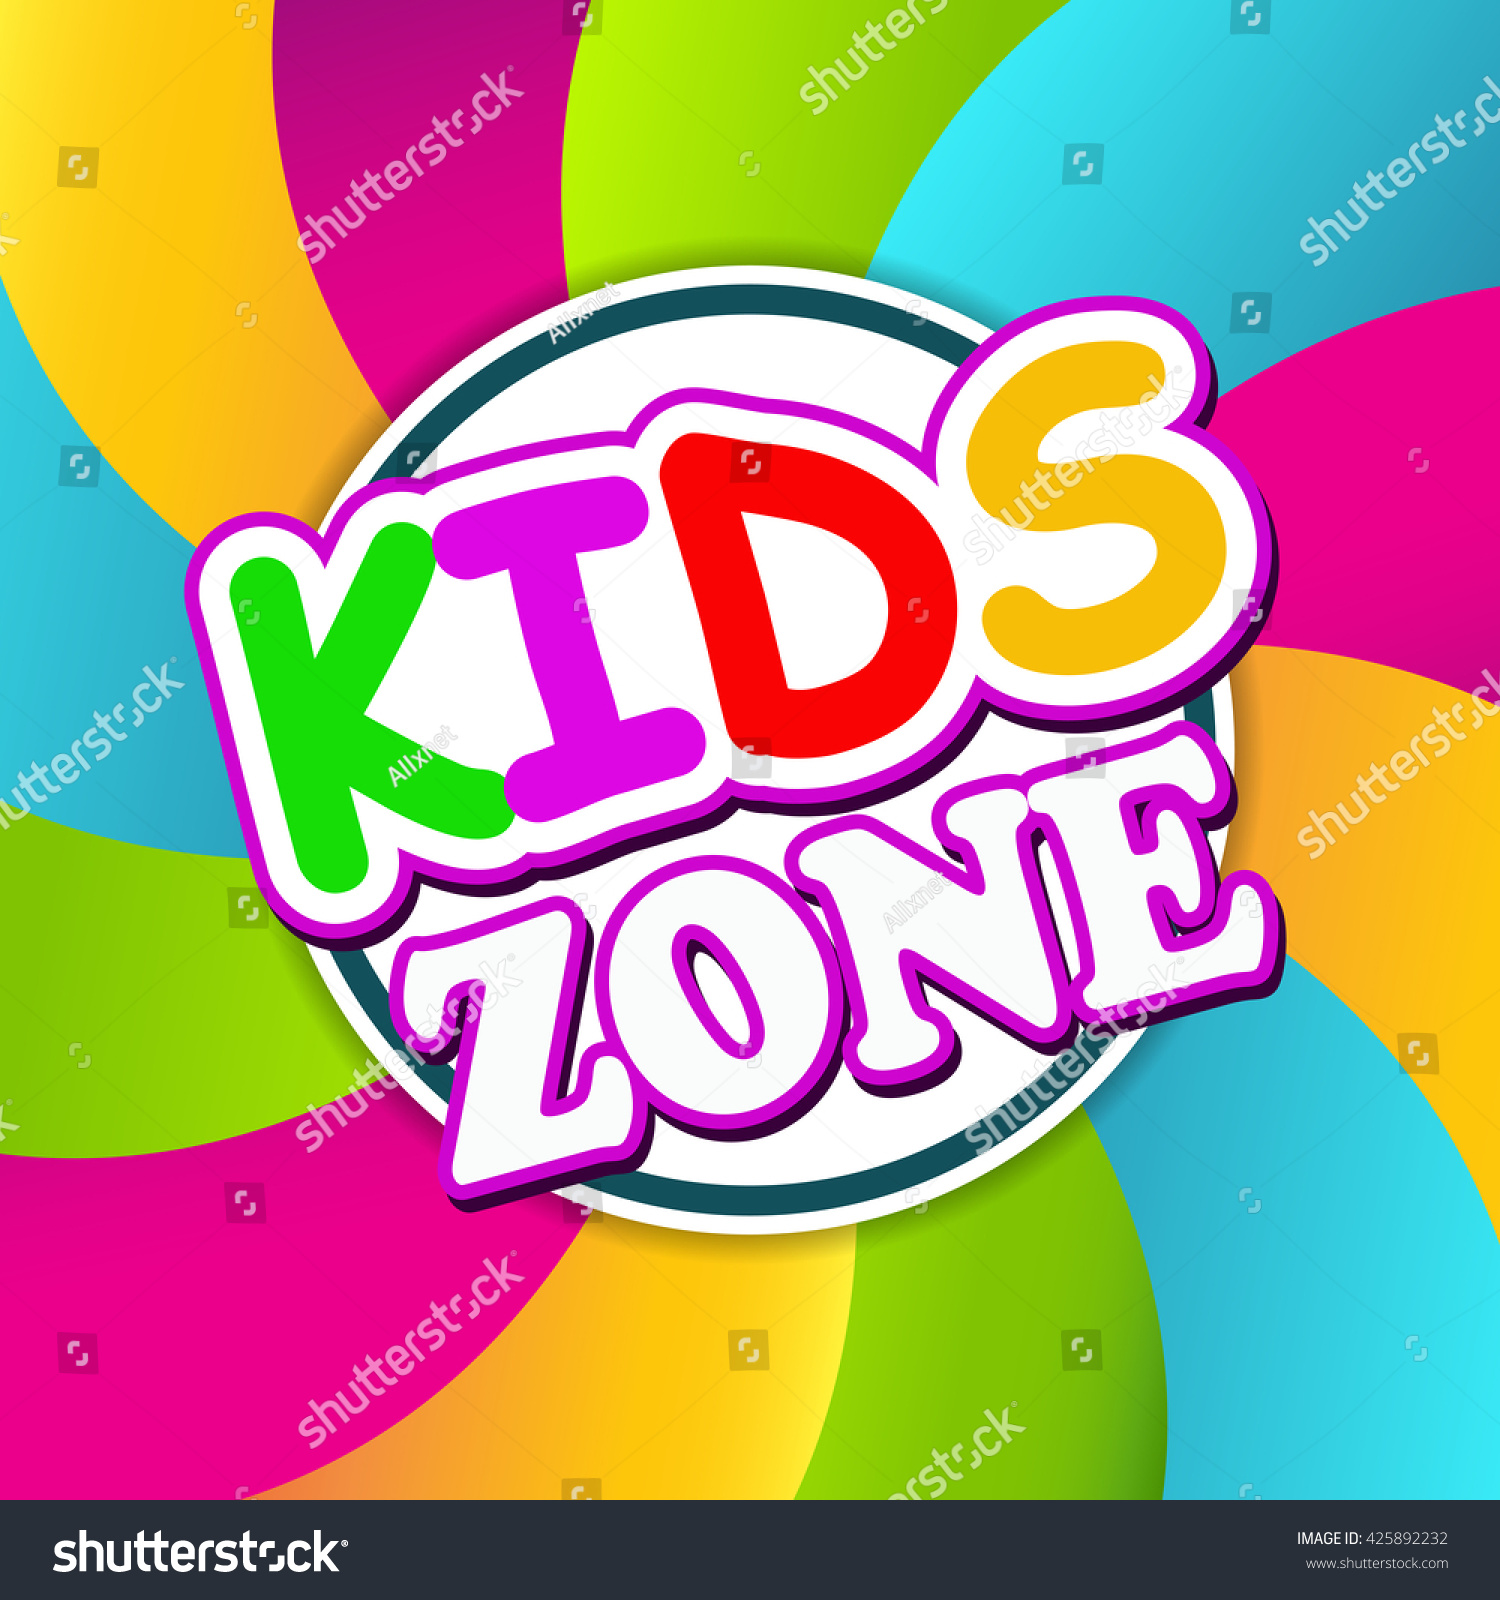 Kids Zone Children Playground Playground School Stock Vector (2018 ...